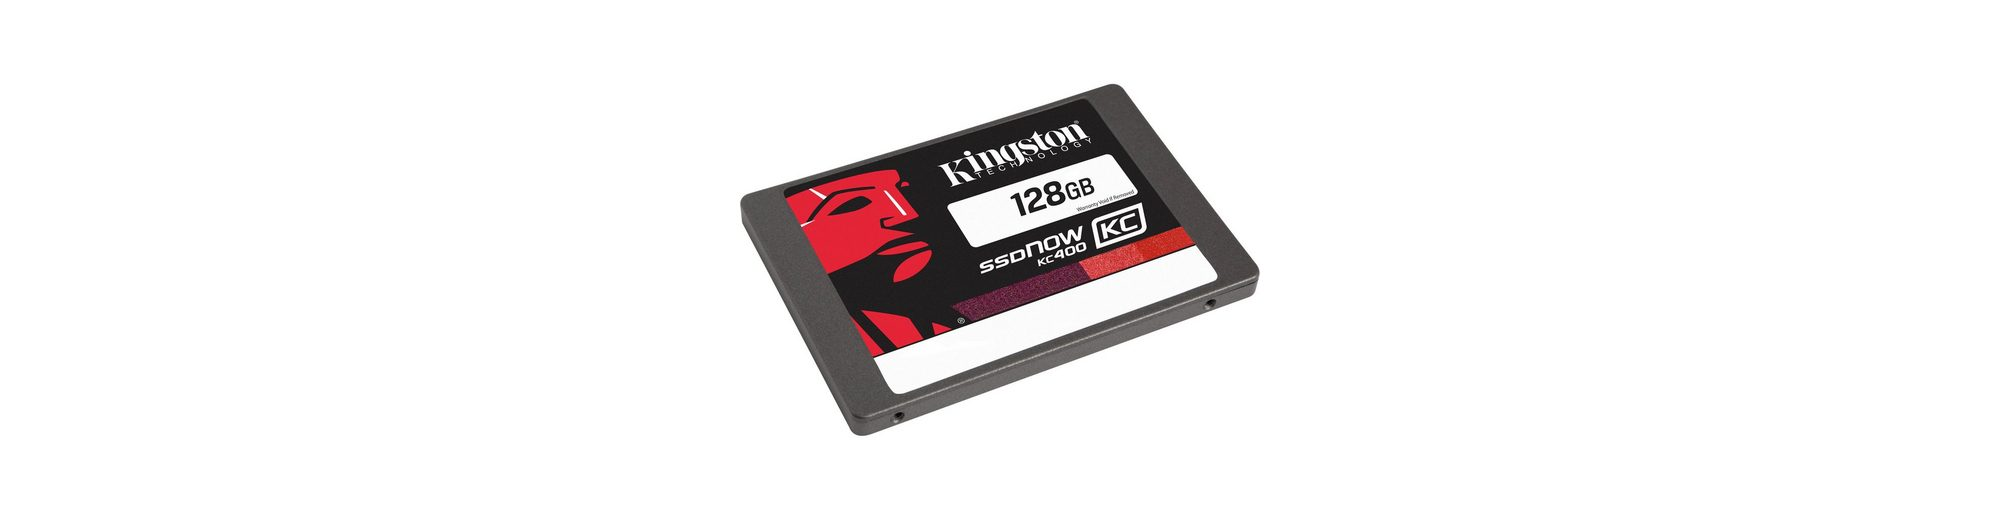 Kingston Solid State Drive »SKC400S3B7A/128G 128 GB Upgrade Bundle Kit«